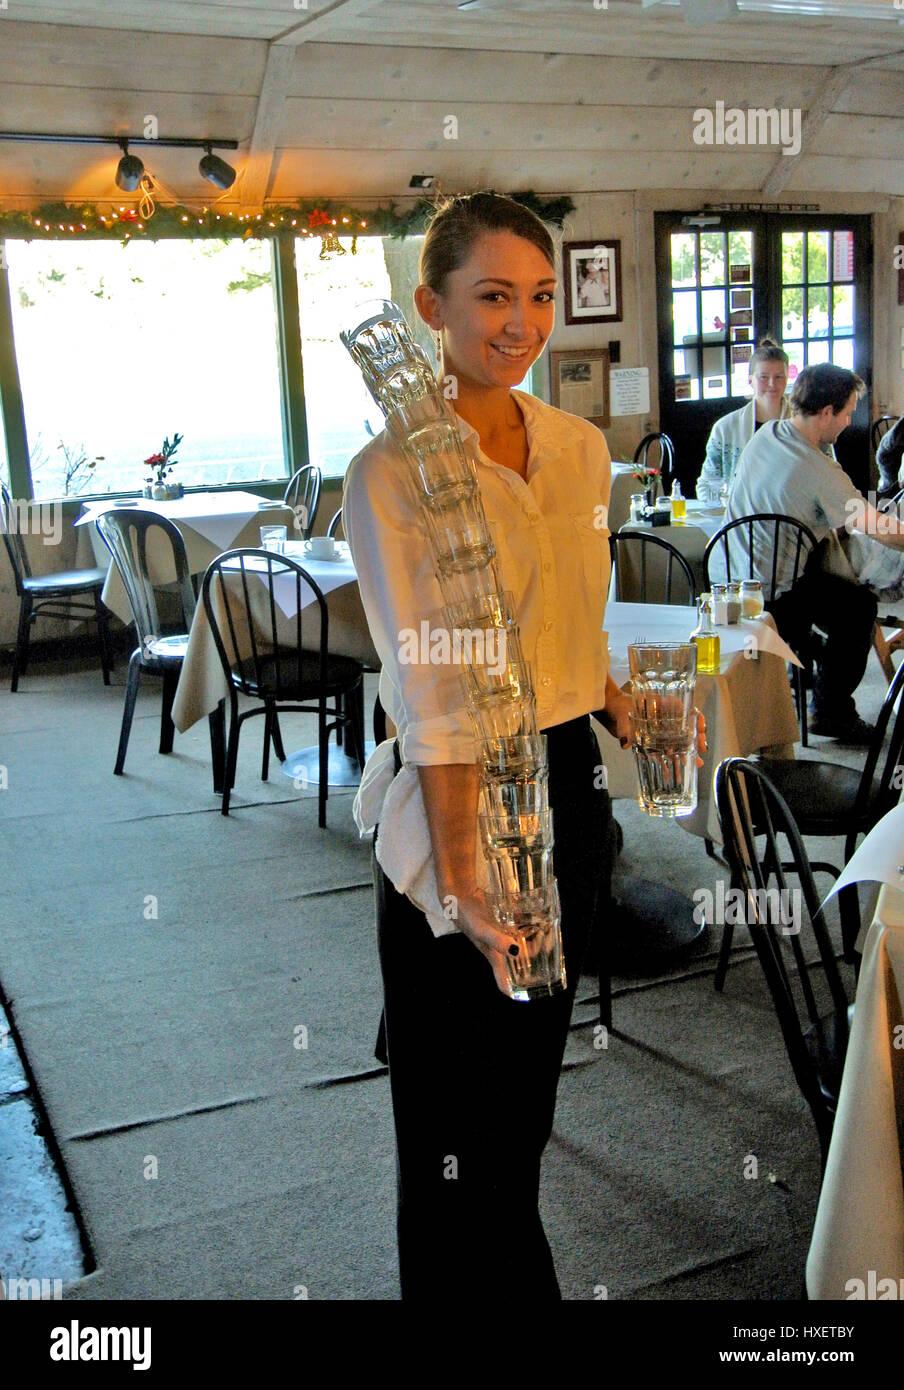 waitress restaurant carrying glasses Stock Photo